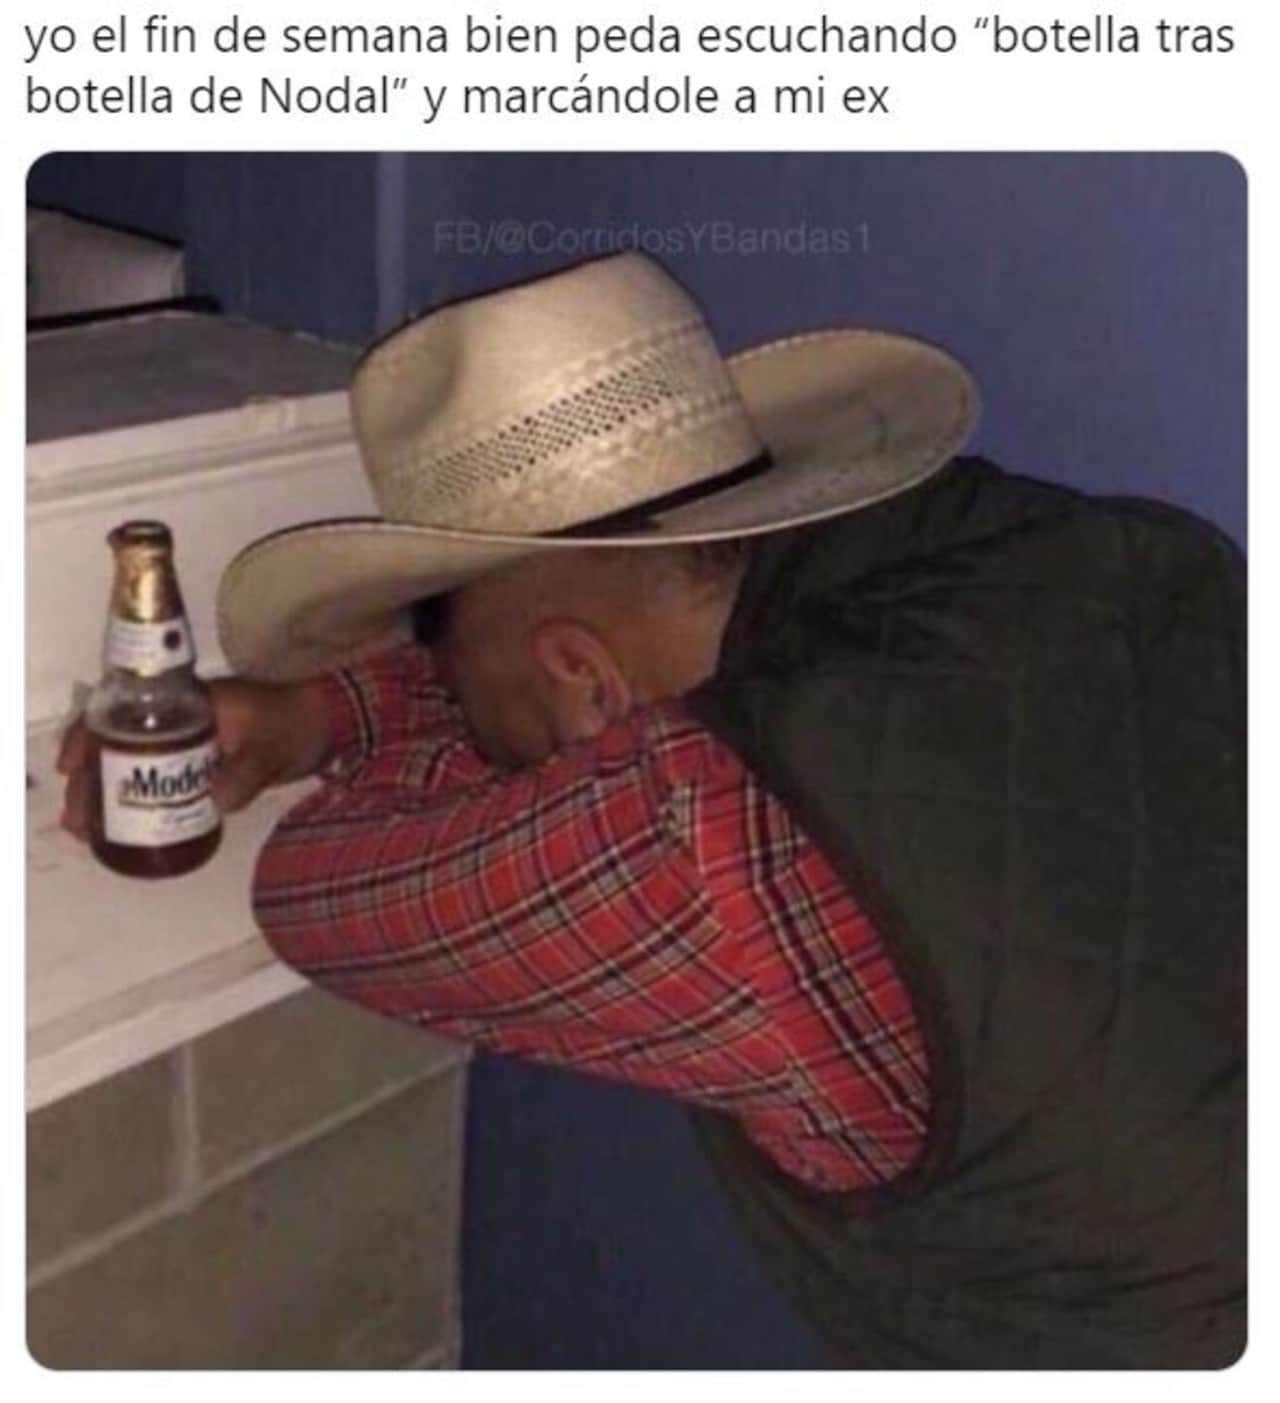 Botella tras botella memes nodal gera mx